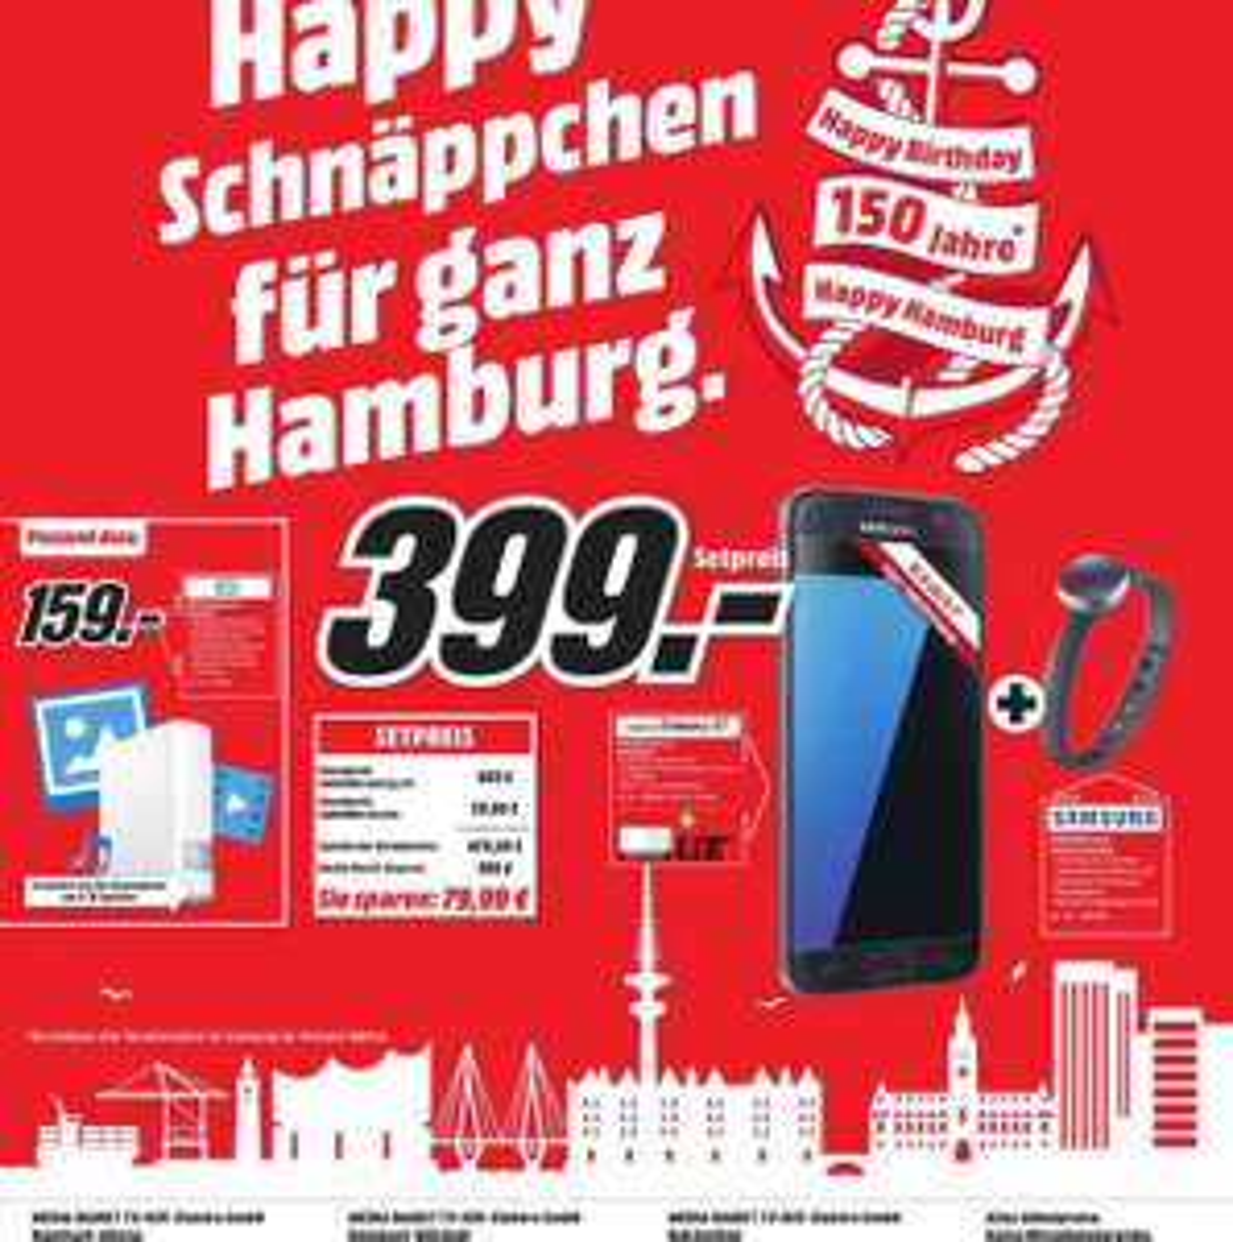 [ Lokal Hamburg und Umgebung Media Märkte ] Samsung Galaxy S7 32GB inkl Samsung Charm für 399€